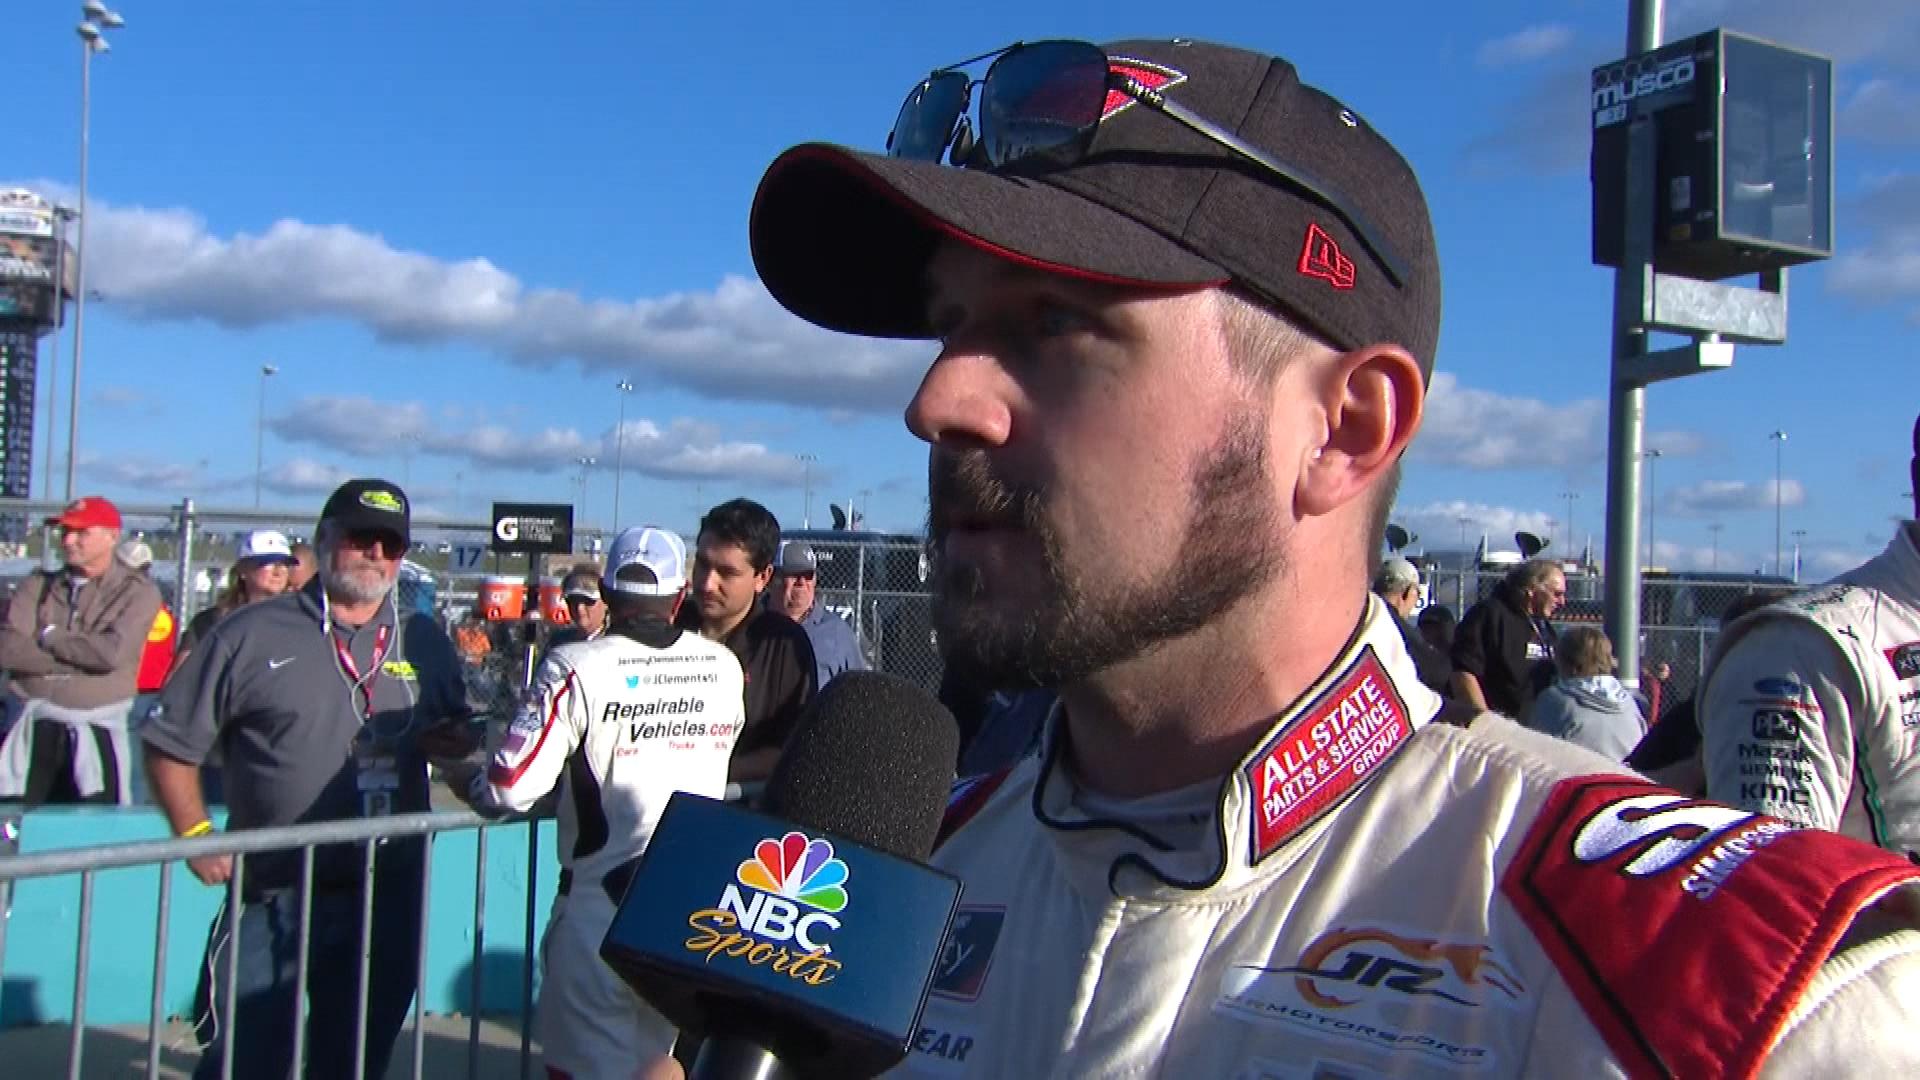 Michael Annett on tire issues in Kansas NASCAR Xfinity race